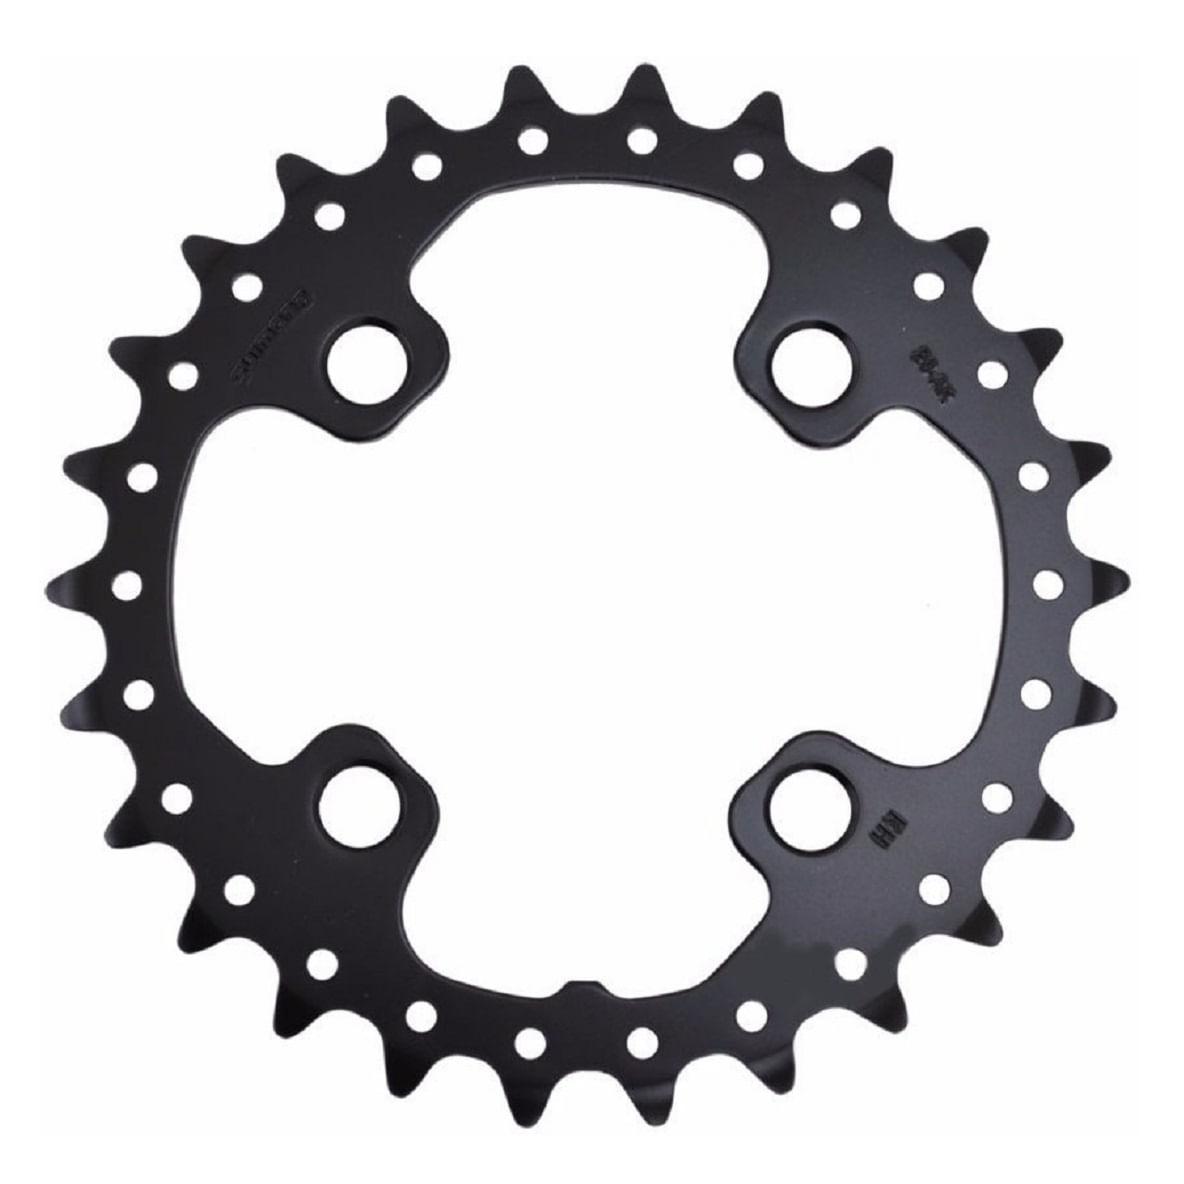 Coroa-de-Bicicleta-MTB-Shimano-SLX-26-Dentes-64mm-FC-M675---9734